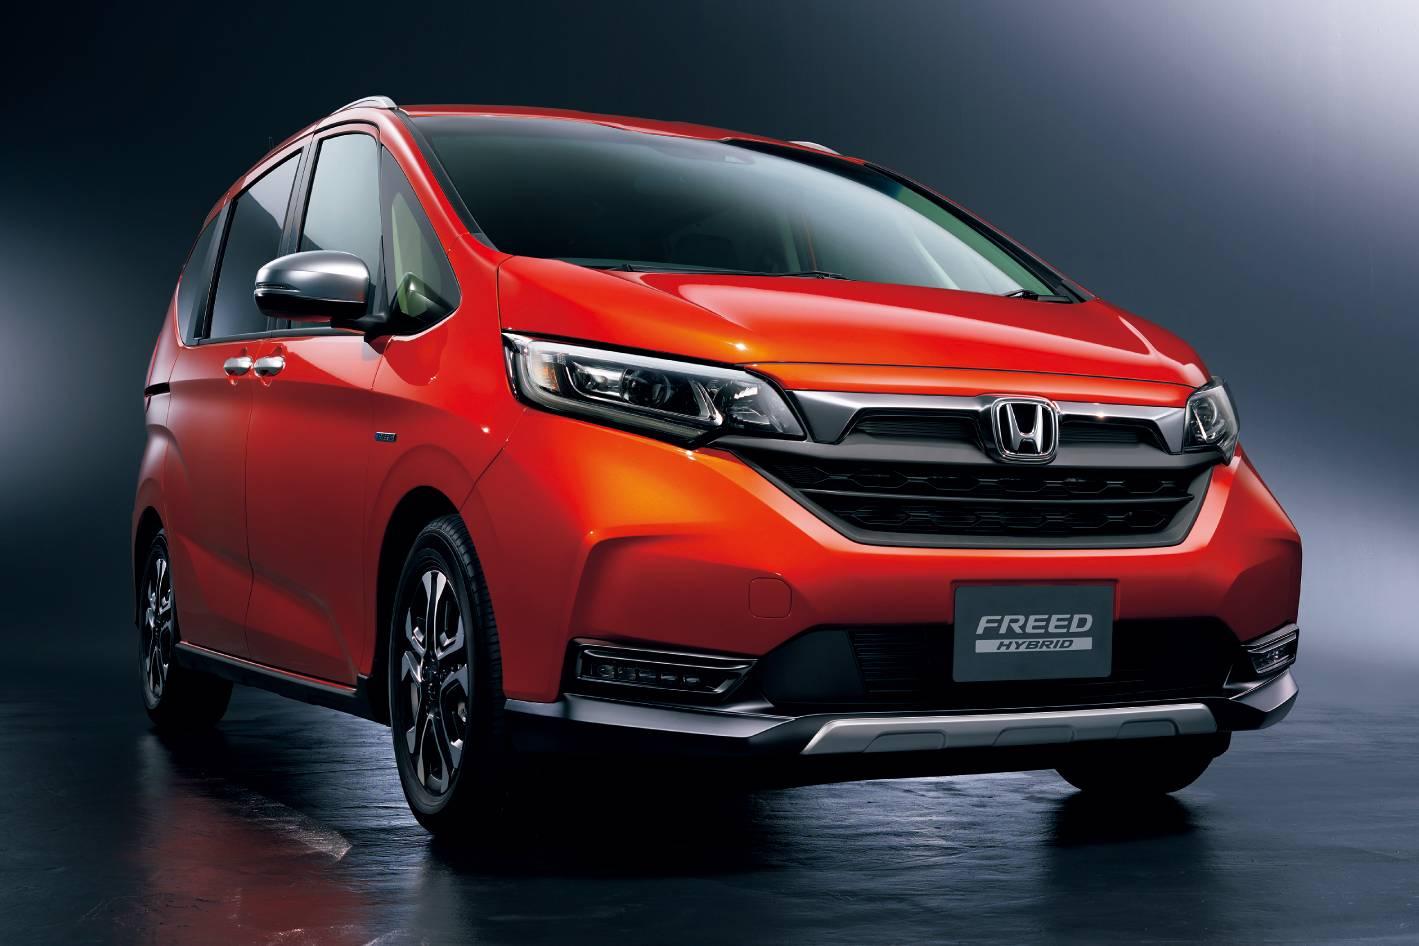 Harga Honda freed dan spesifikasi